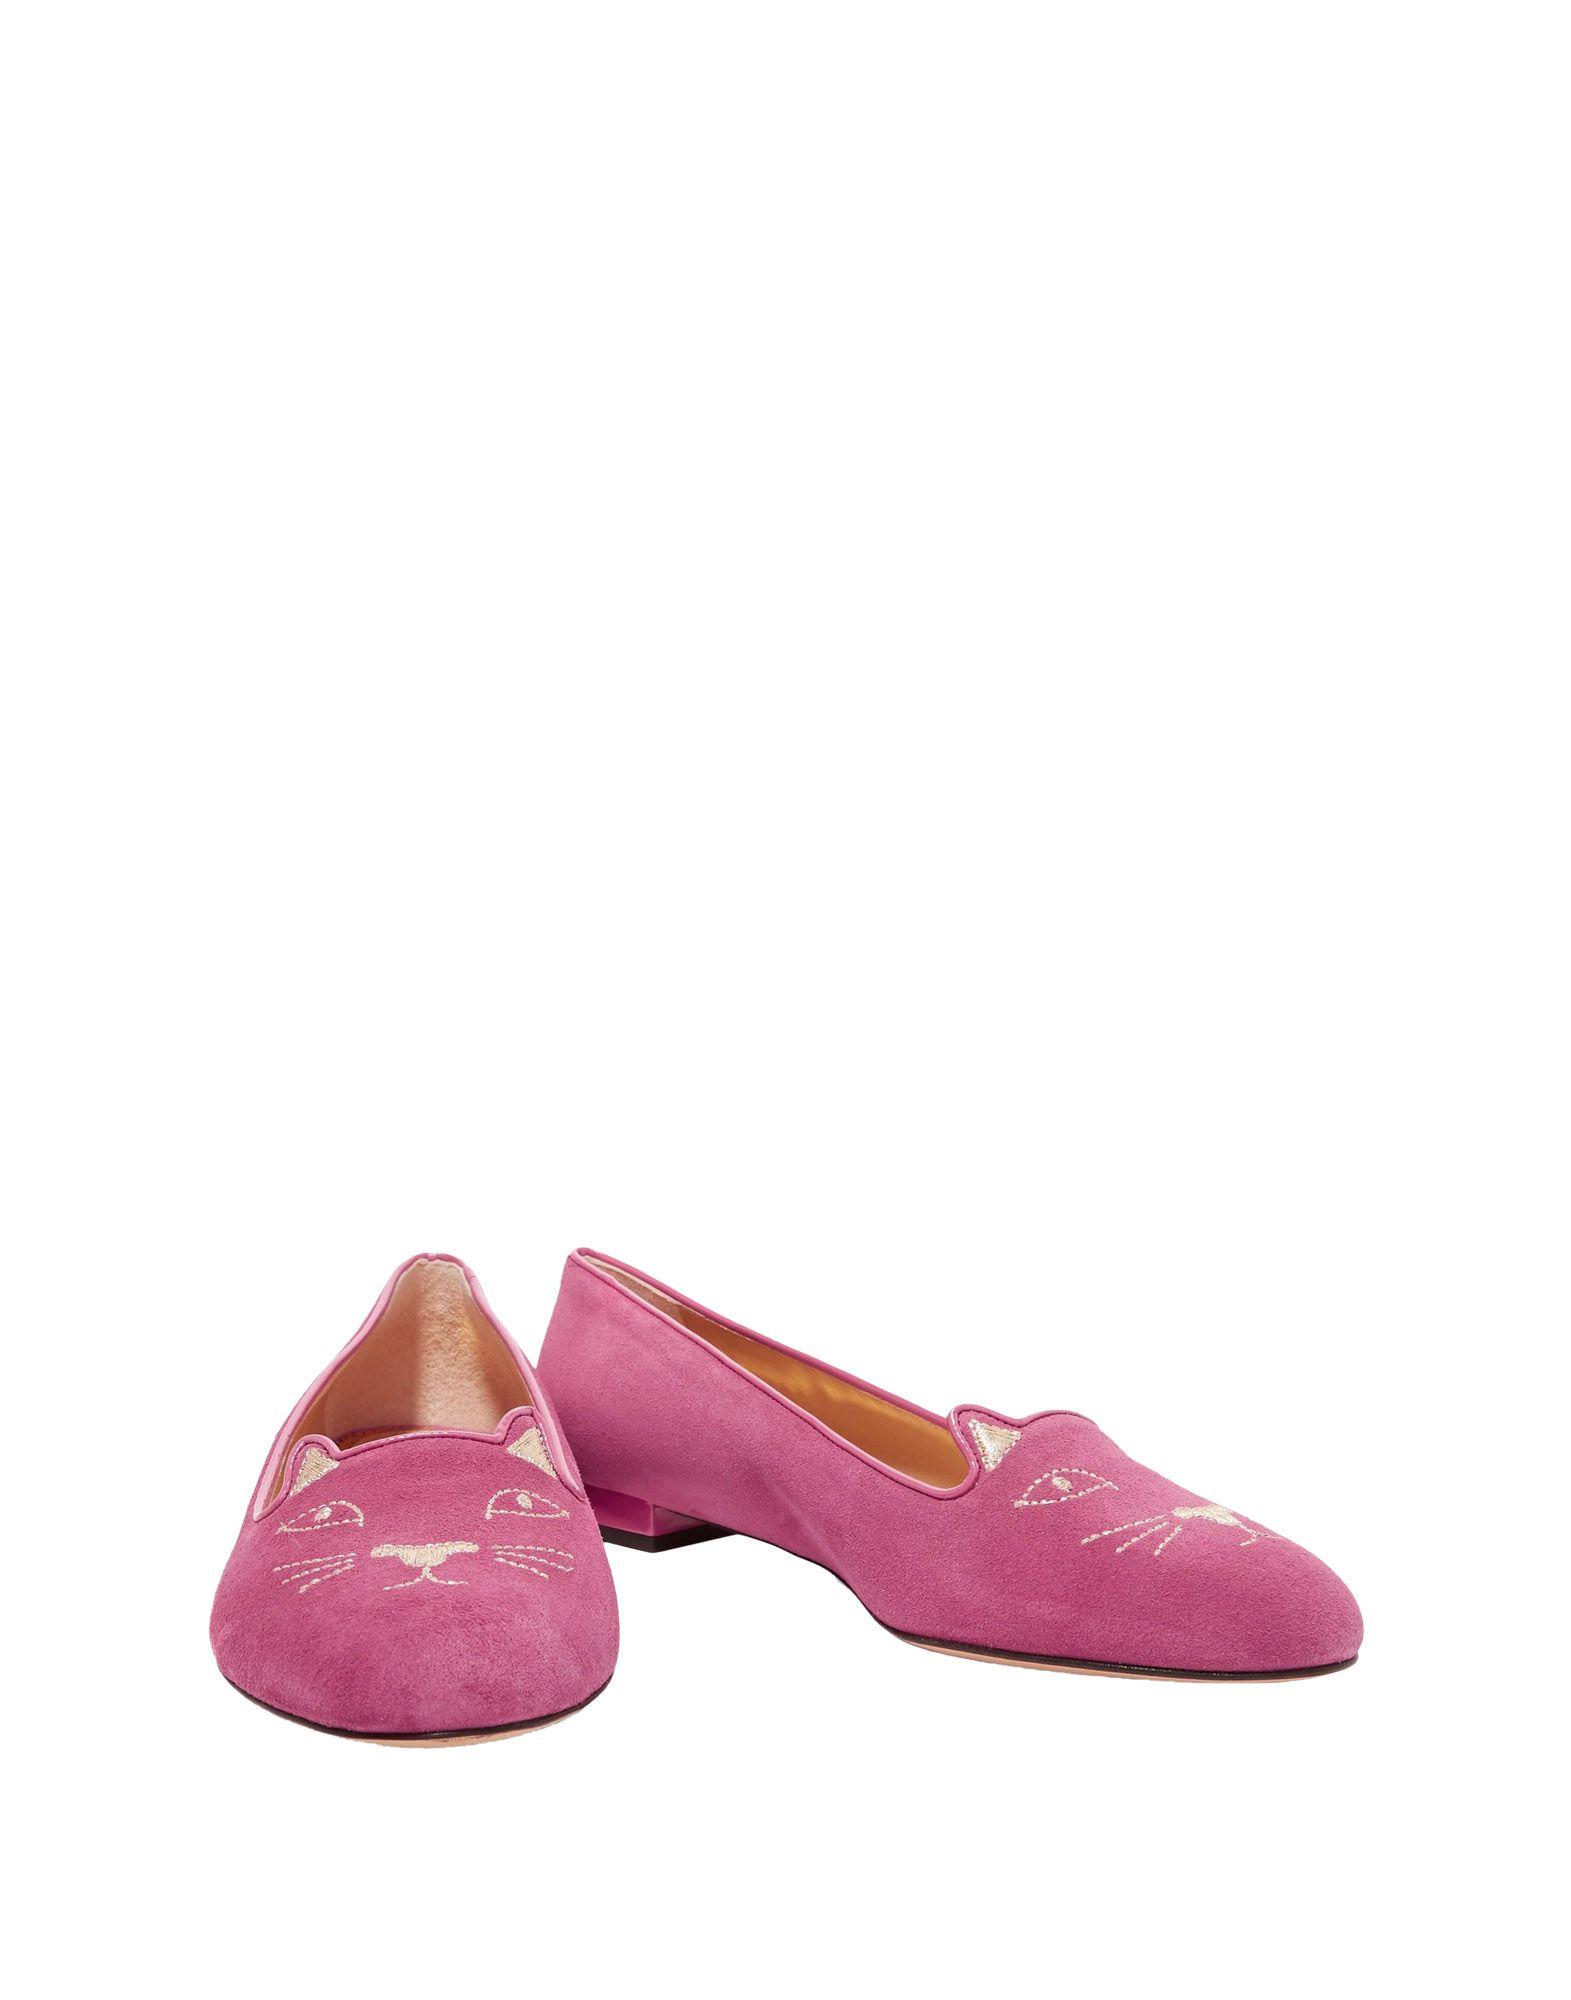 Charlotte Olympia Mokassins Damen Damen Mokassins  11513738JU Neue Schuhe b7dcdb